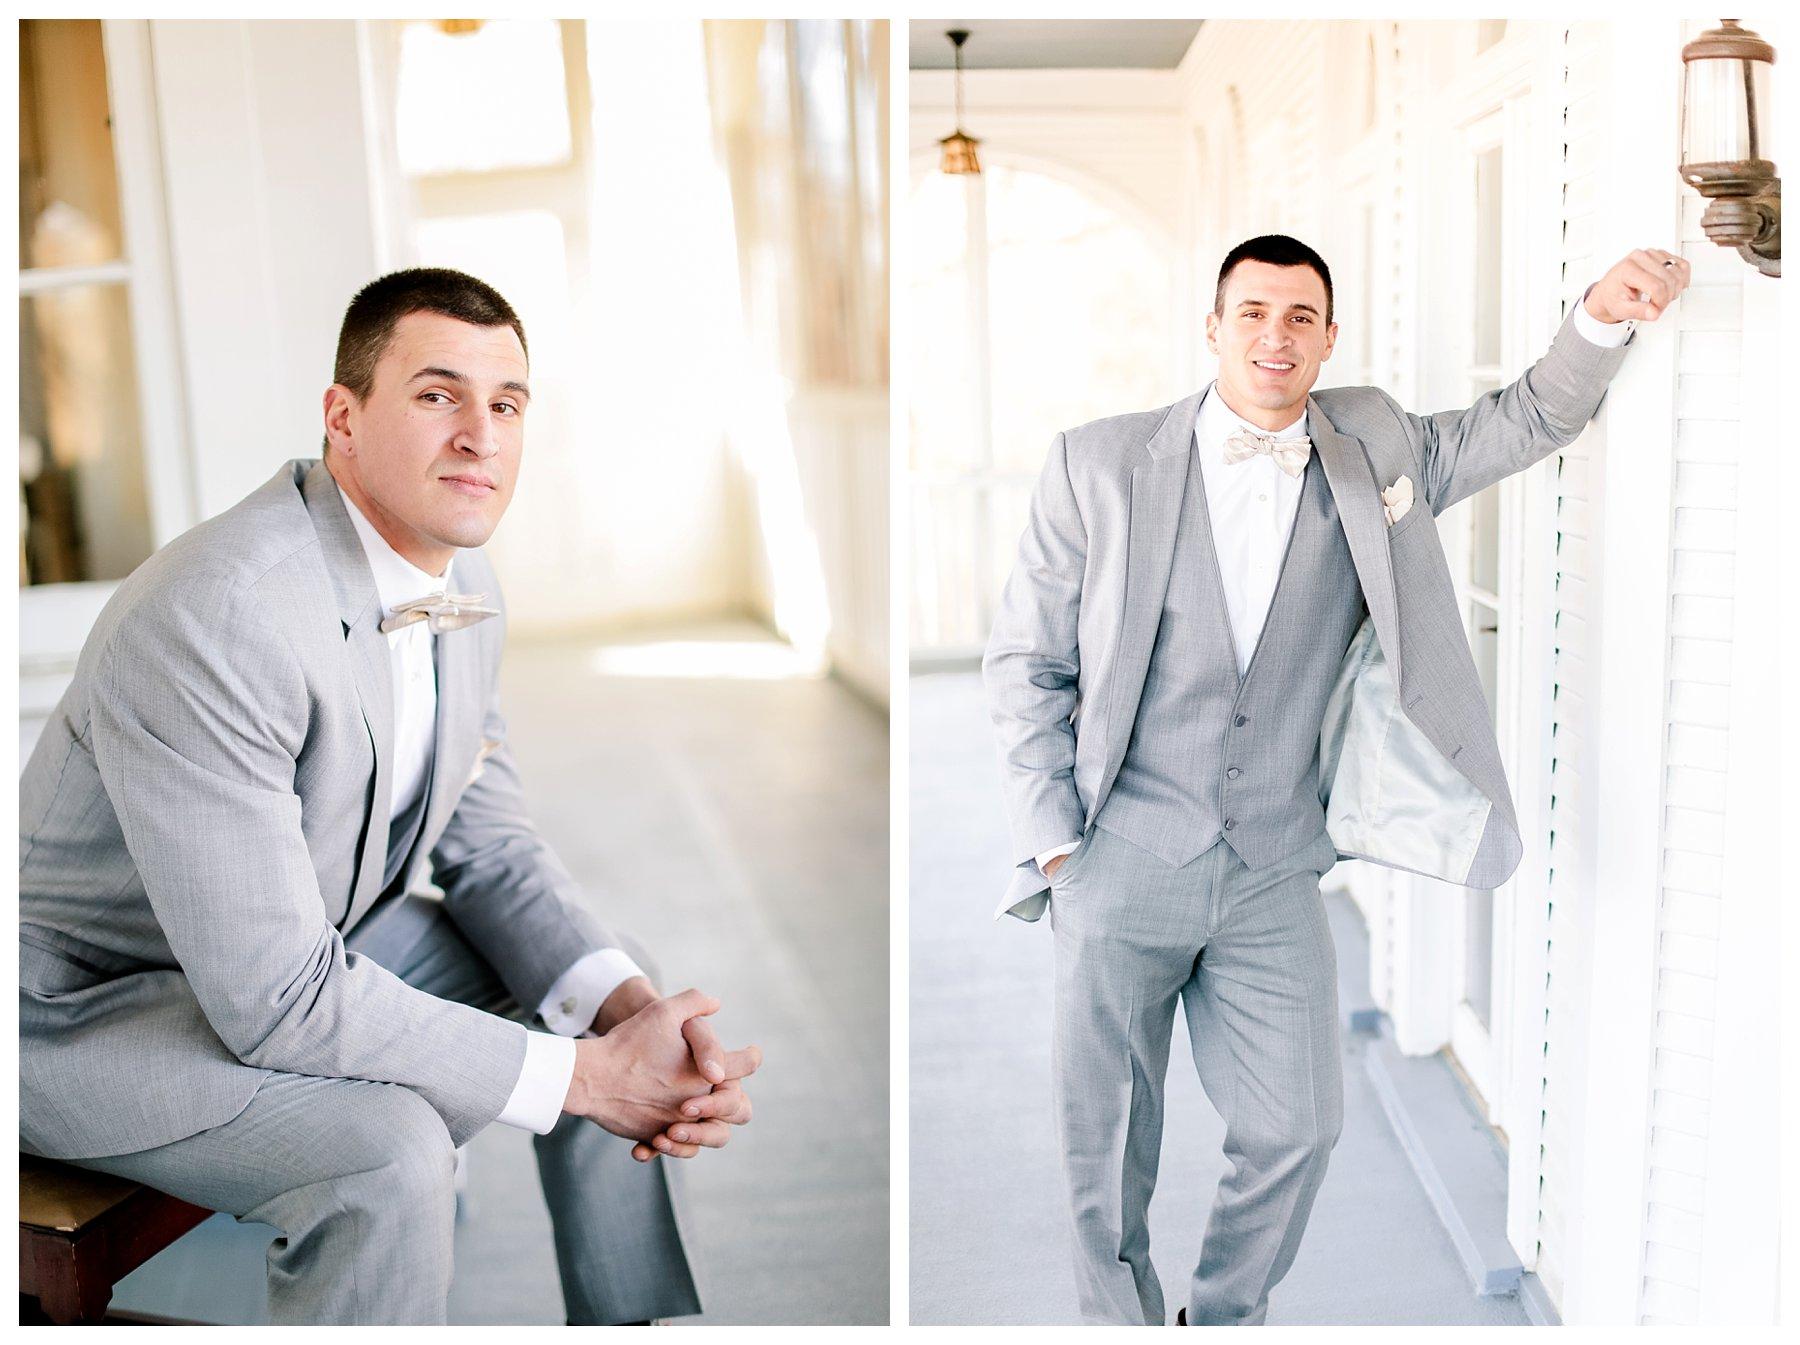 photographer_wedding_saint_louis_Kansas_City_Photography_Videography_workshop_training_styled_engagement_Lake_Ozark_KC_MO_STL_Rolla_Hermann_Saint_James_0368.jpg